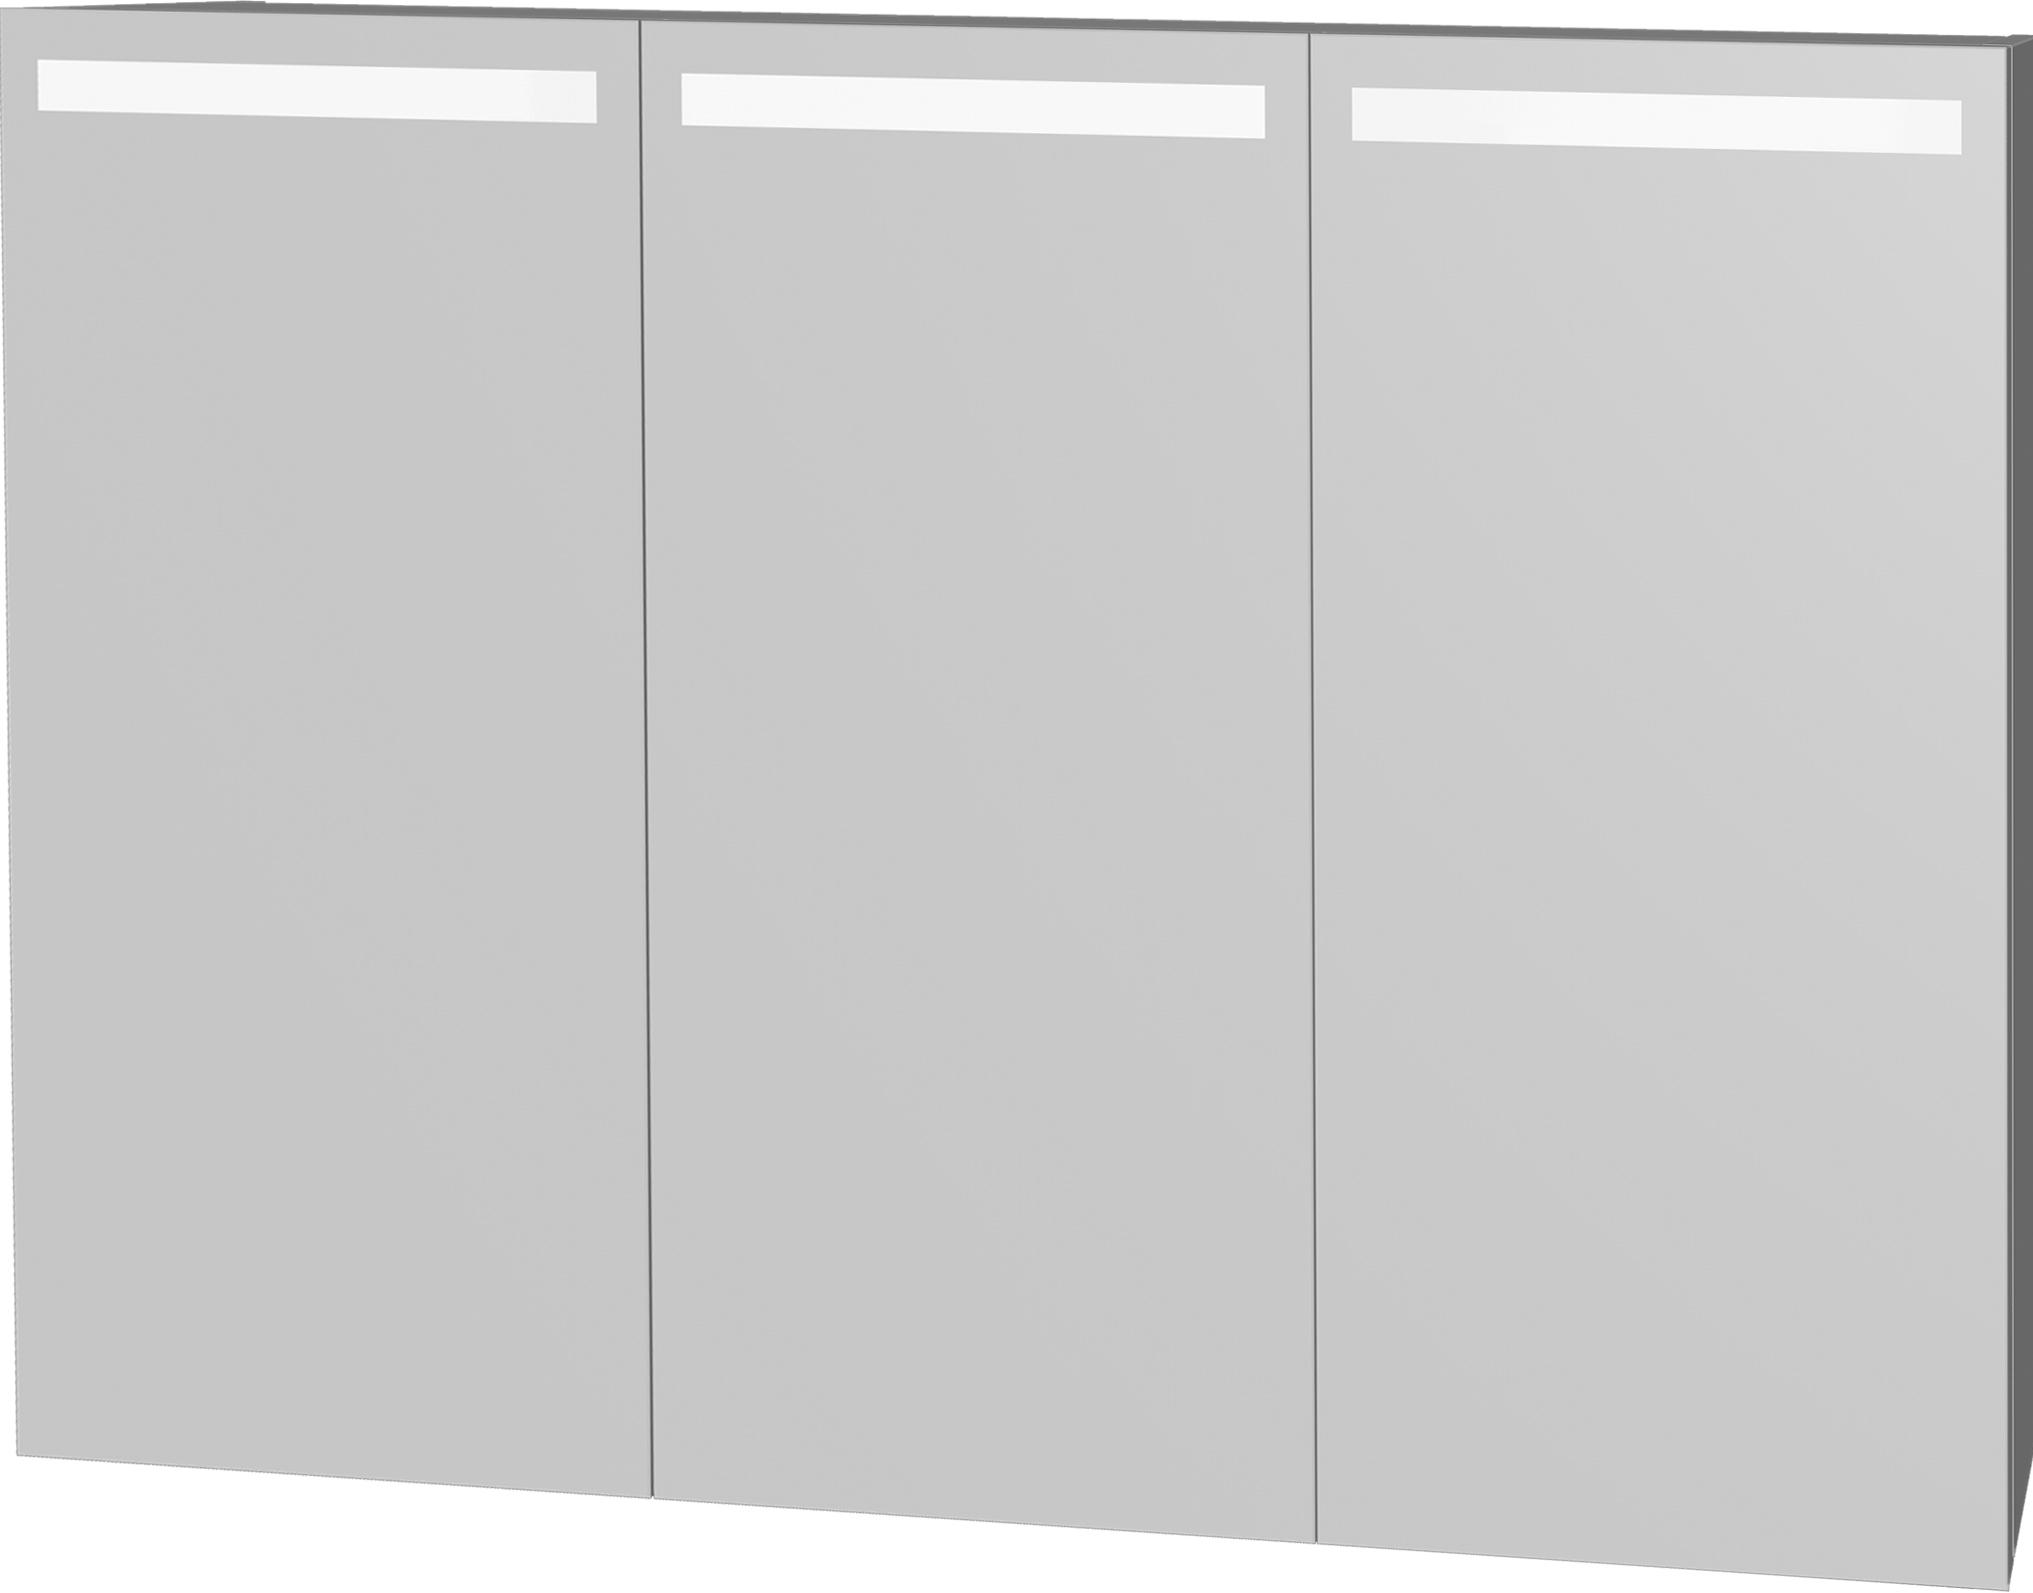 Intedoor Zrcadlová skříňka 120x72 cm, s osvětlením DZS120